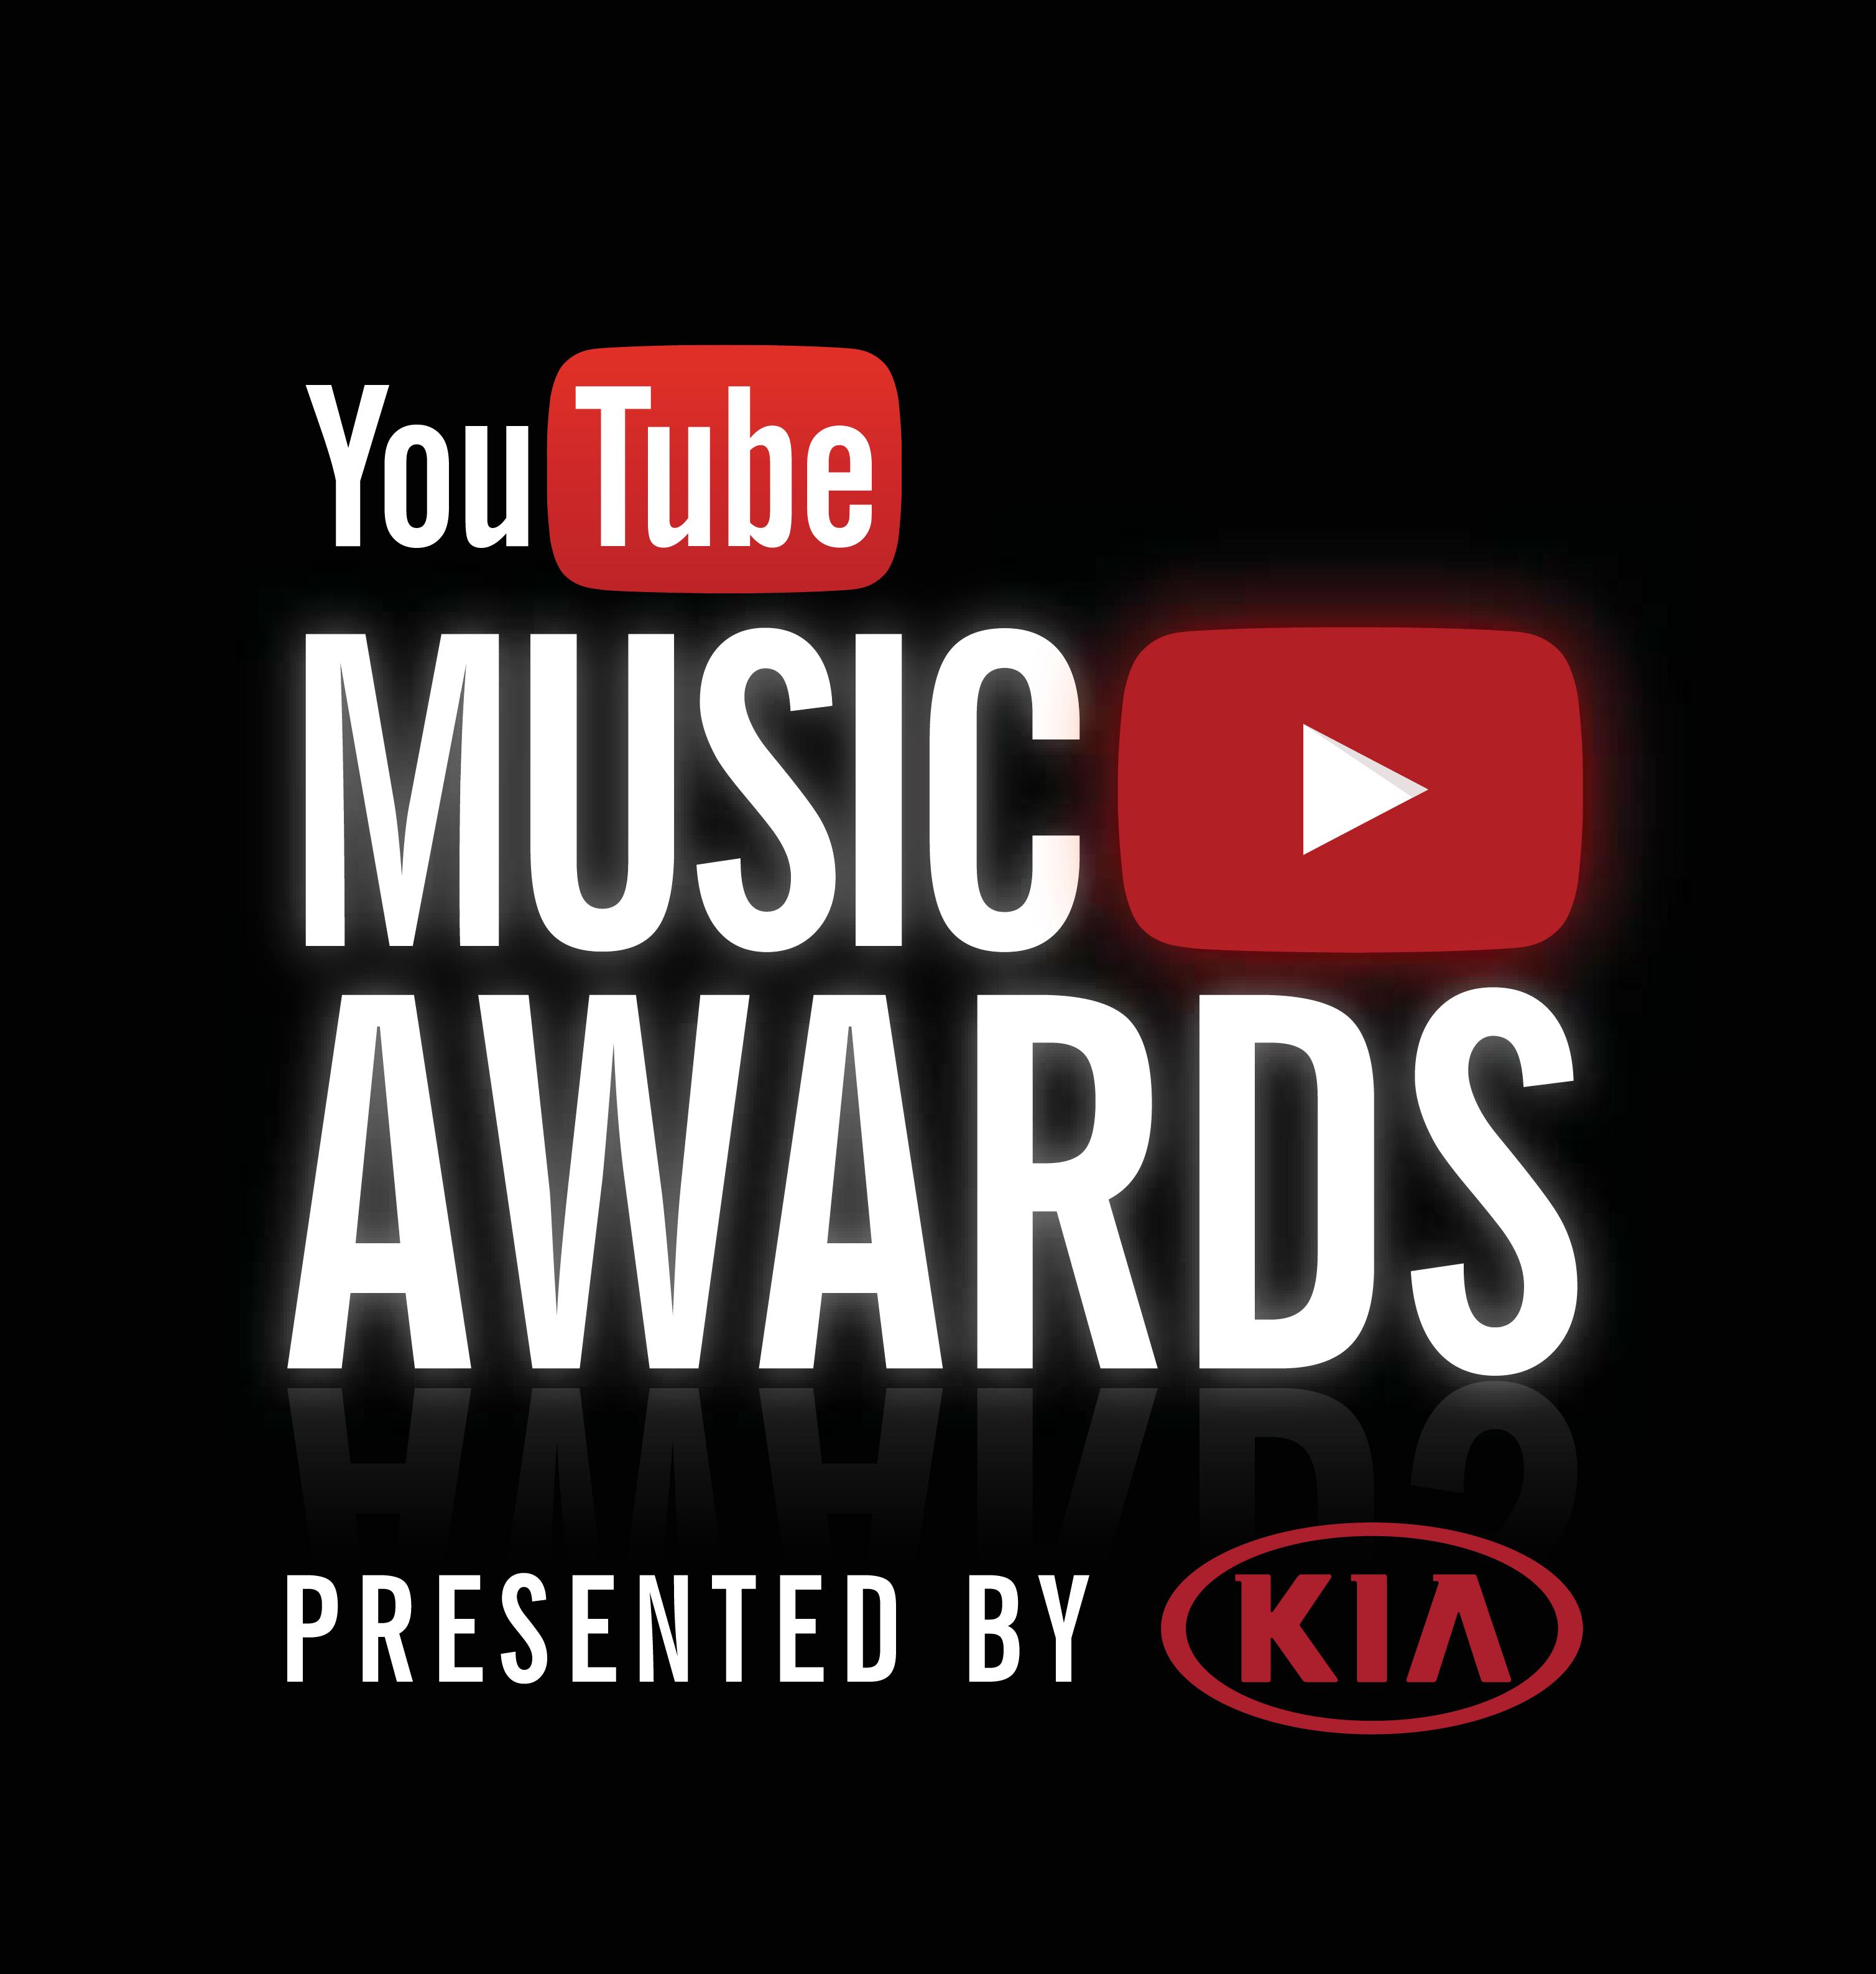 youtube music awards kia sempre protagonistareport campania report campania. Black Bedroom Furniture Sets. Home Design Ideas